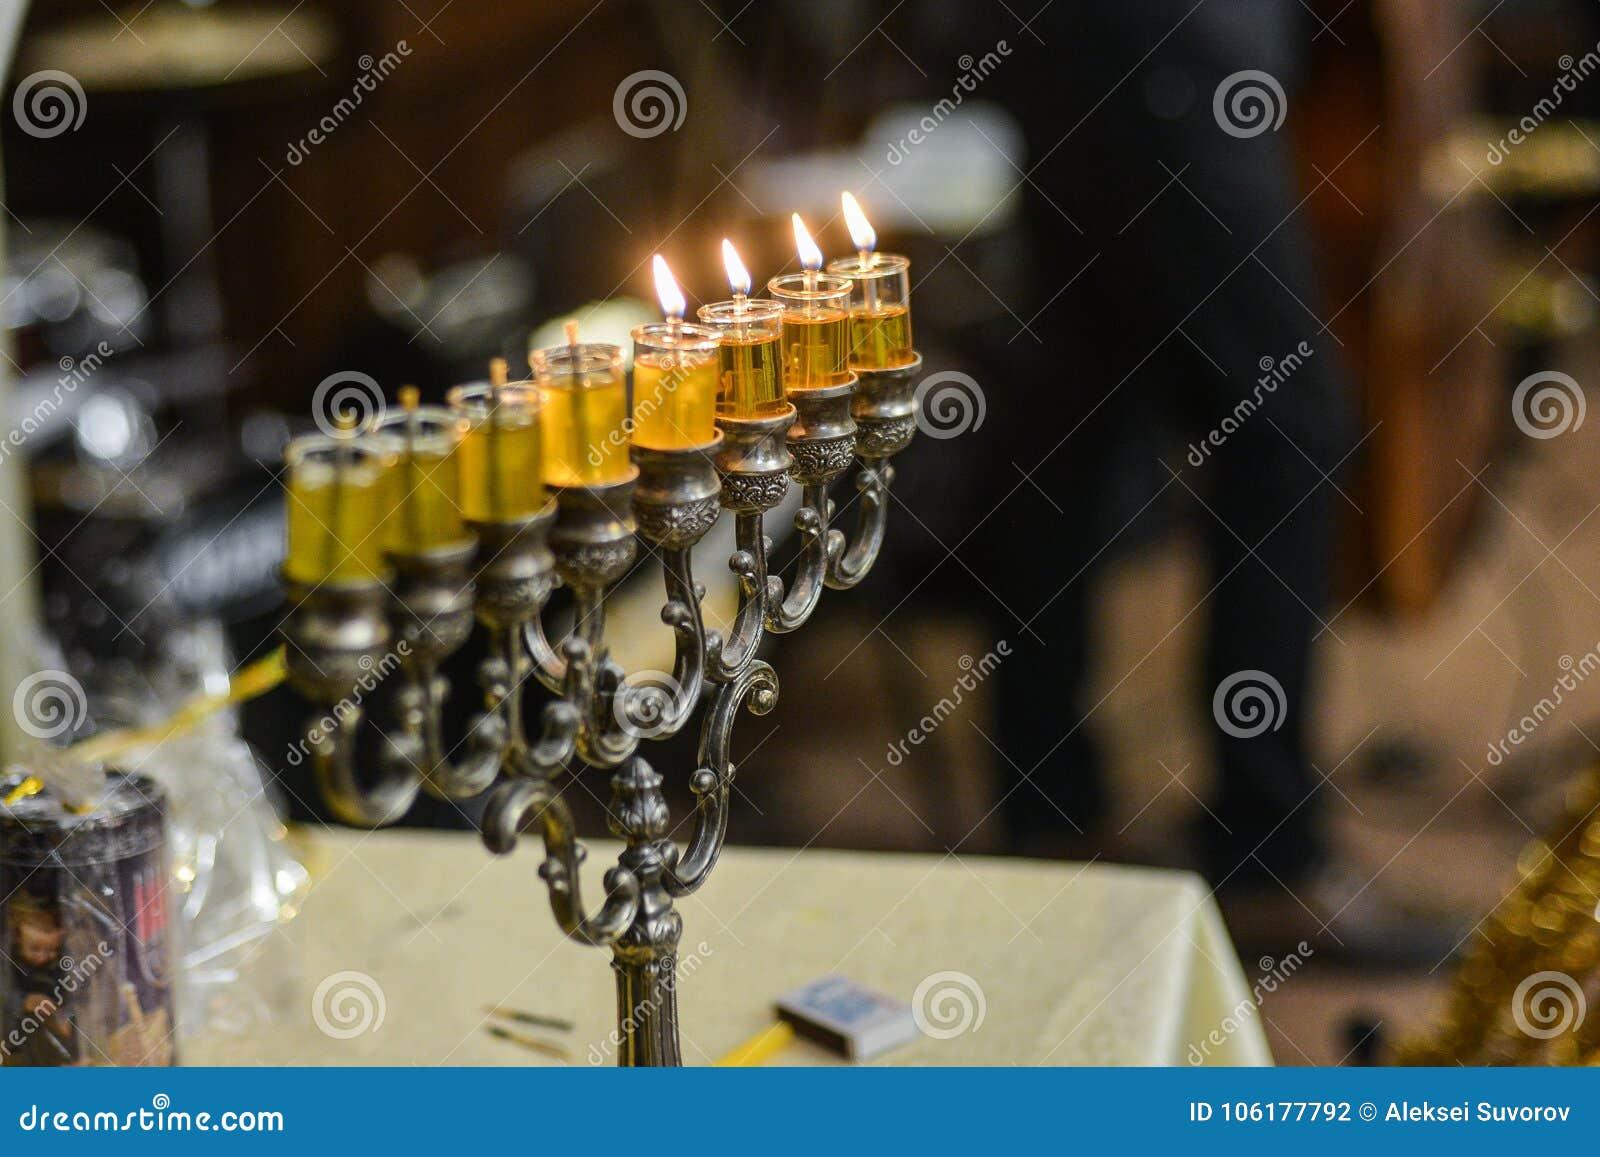 Image of jewish holiday Hanukkah background with menorah traditional candelabra